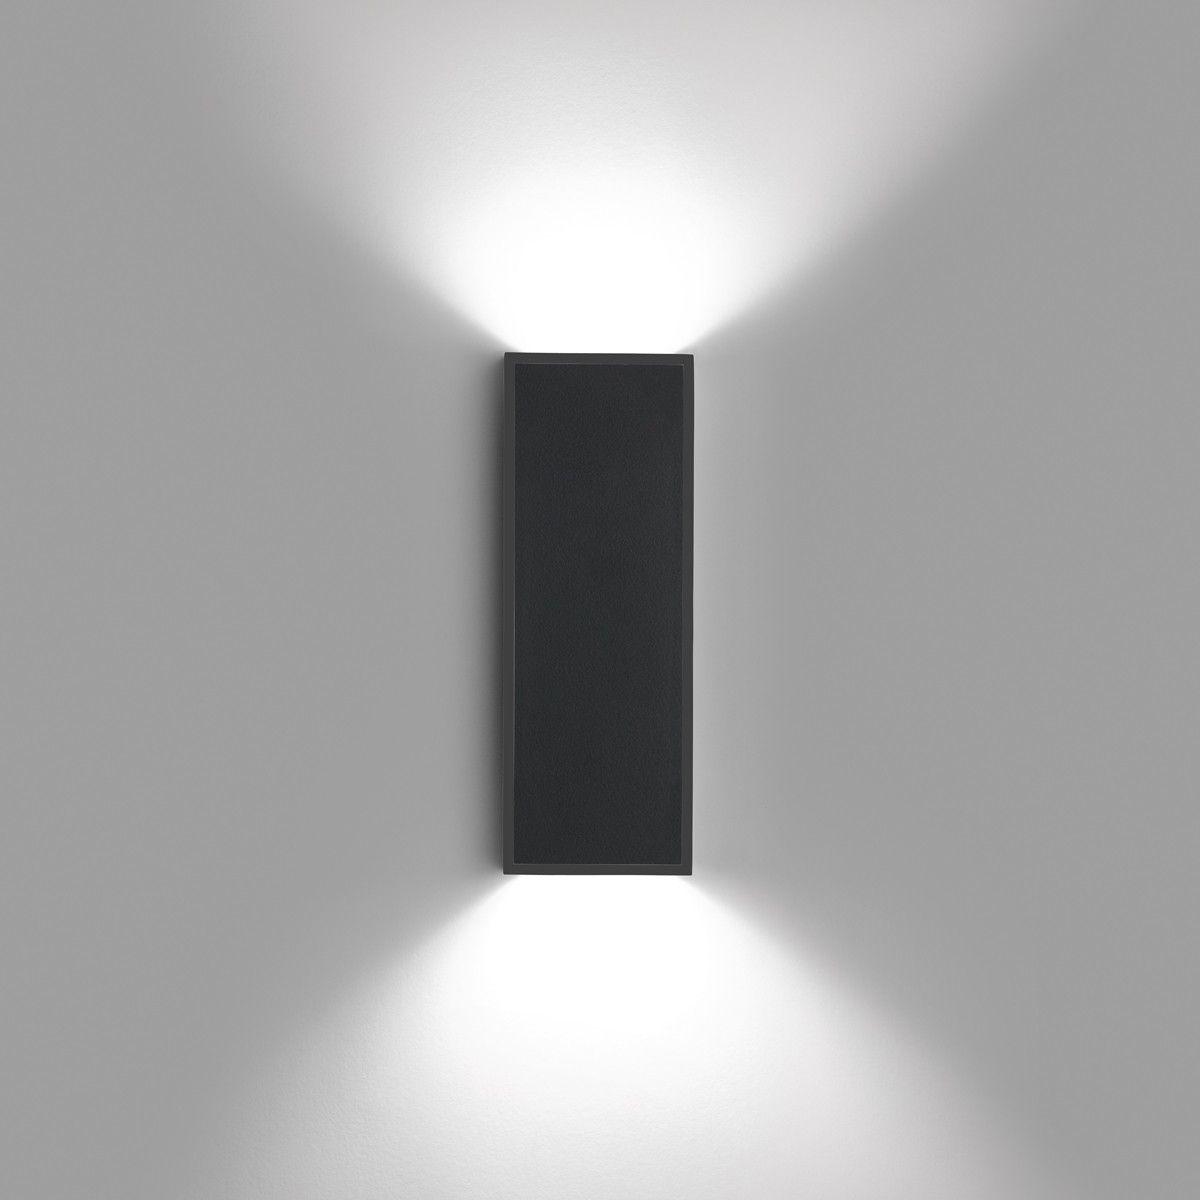 Badezimmer Lampe Wand Schwarz